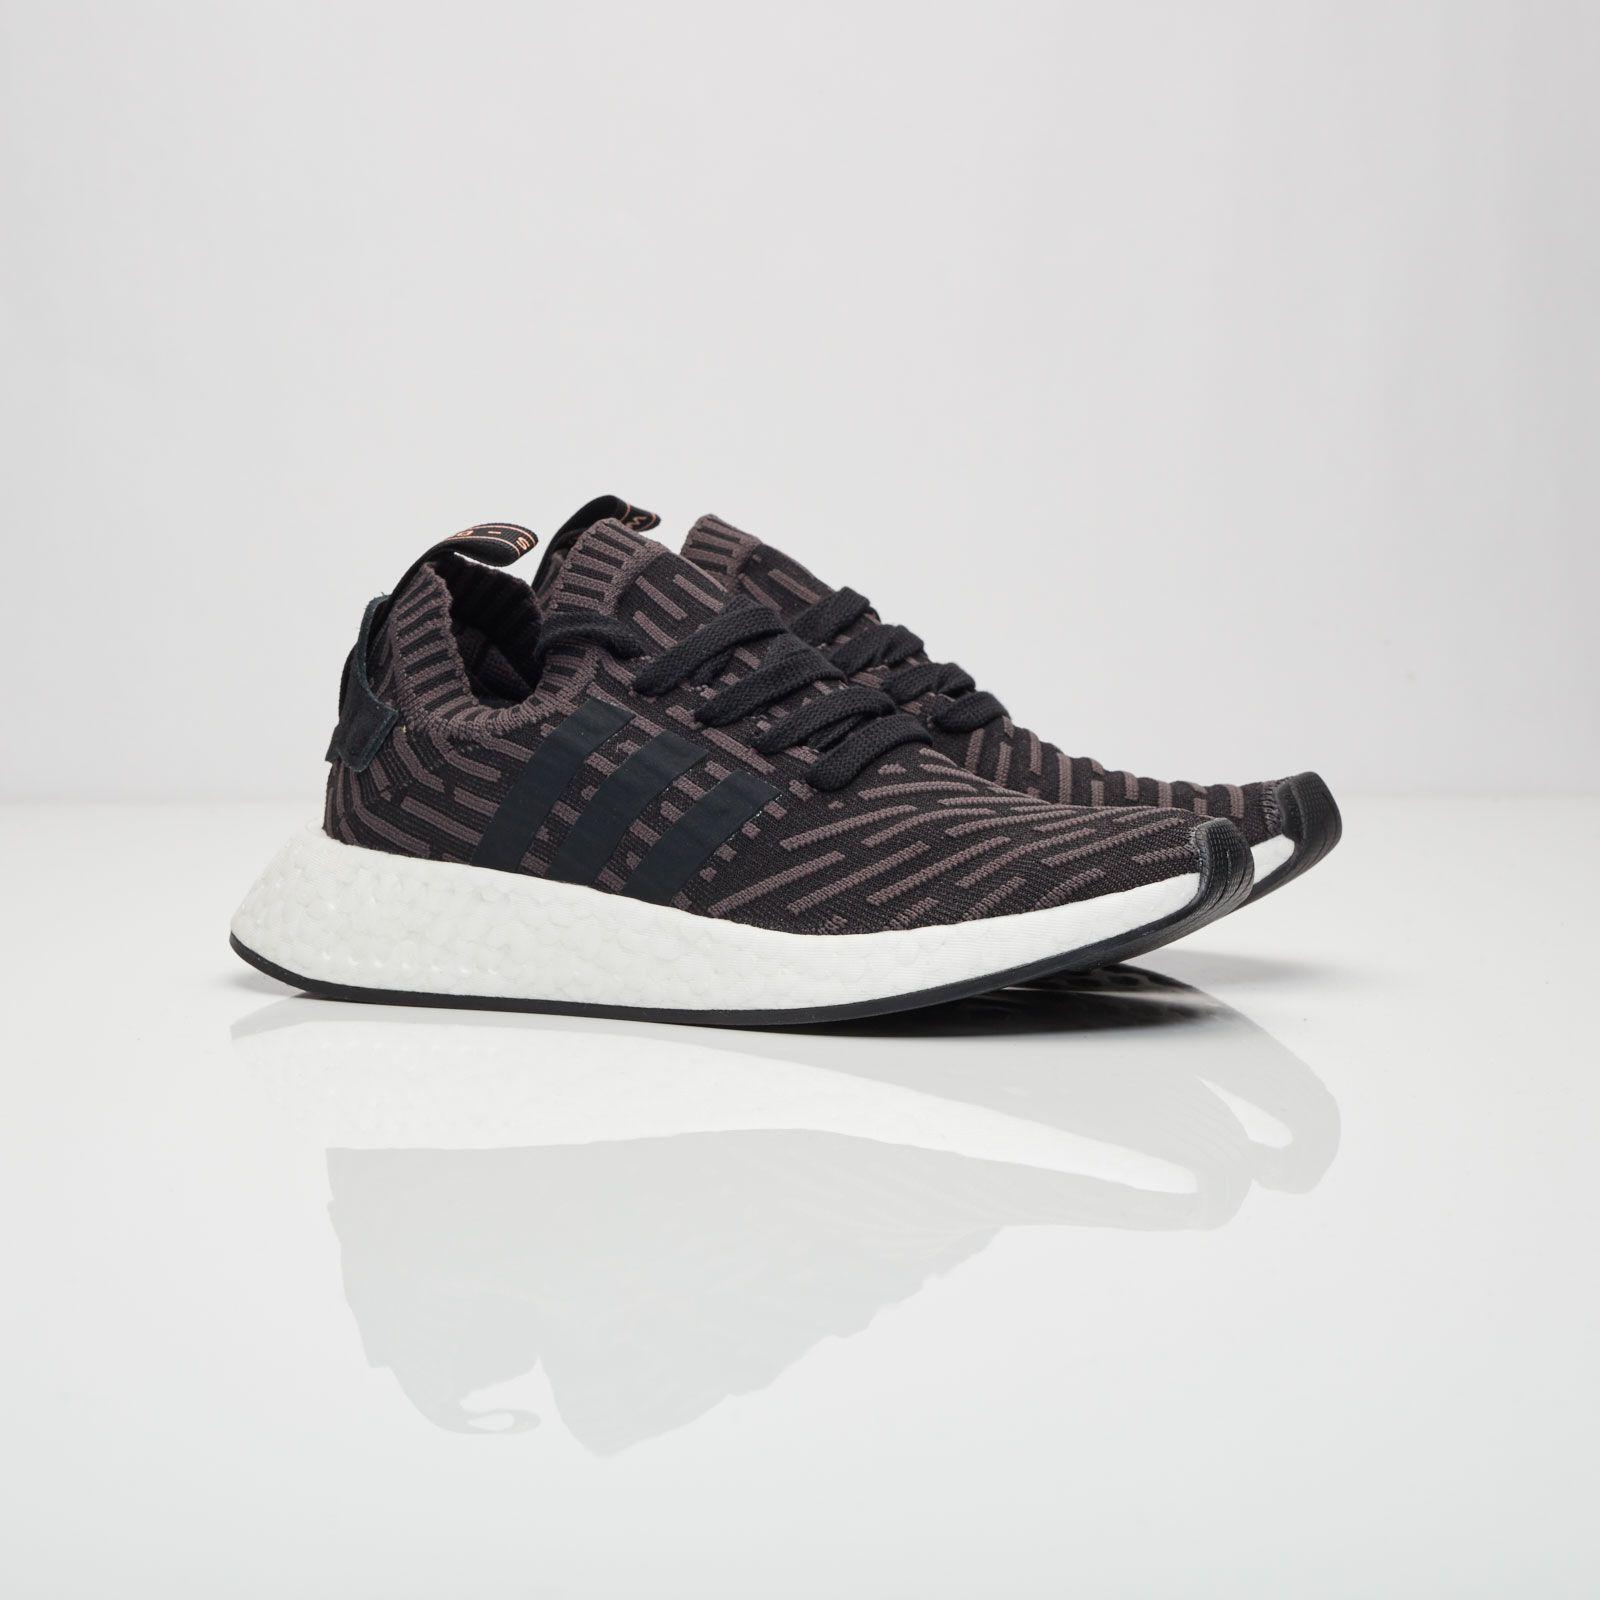 pztajb MIDNIGHT ONLINE Adidas #NMD R2 PK Trace Cargo / Core Black Credit